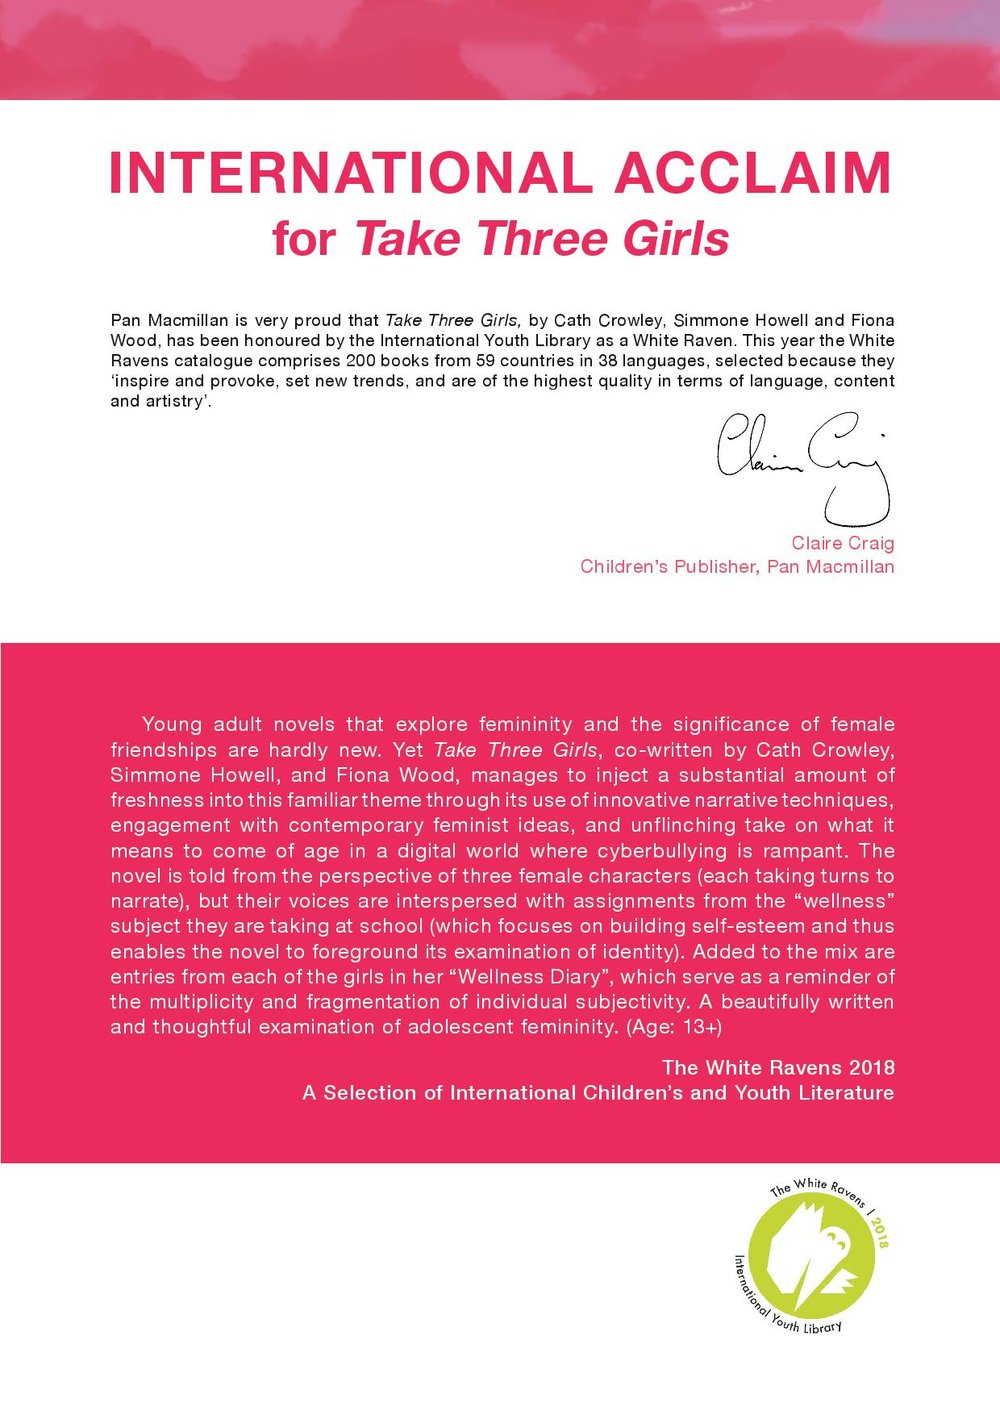 T3G_International Acclaim-page-001.jpg